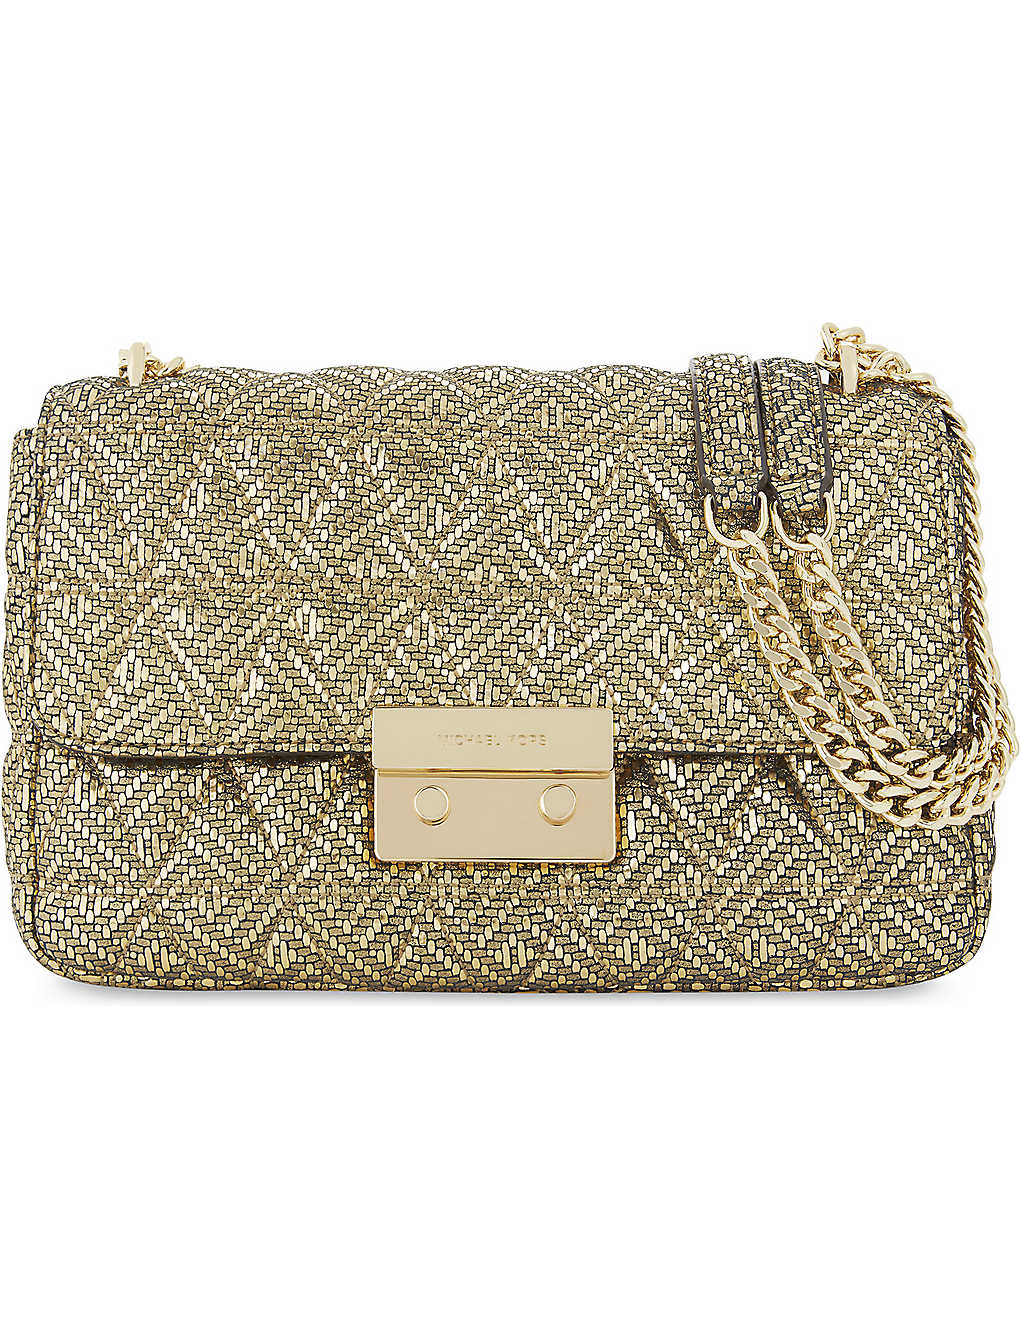 428454ad876079 MICHAEL MICHAEL KORS - Sloan metallic quilted leather shoulder bag ...